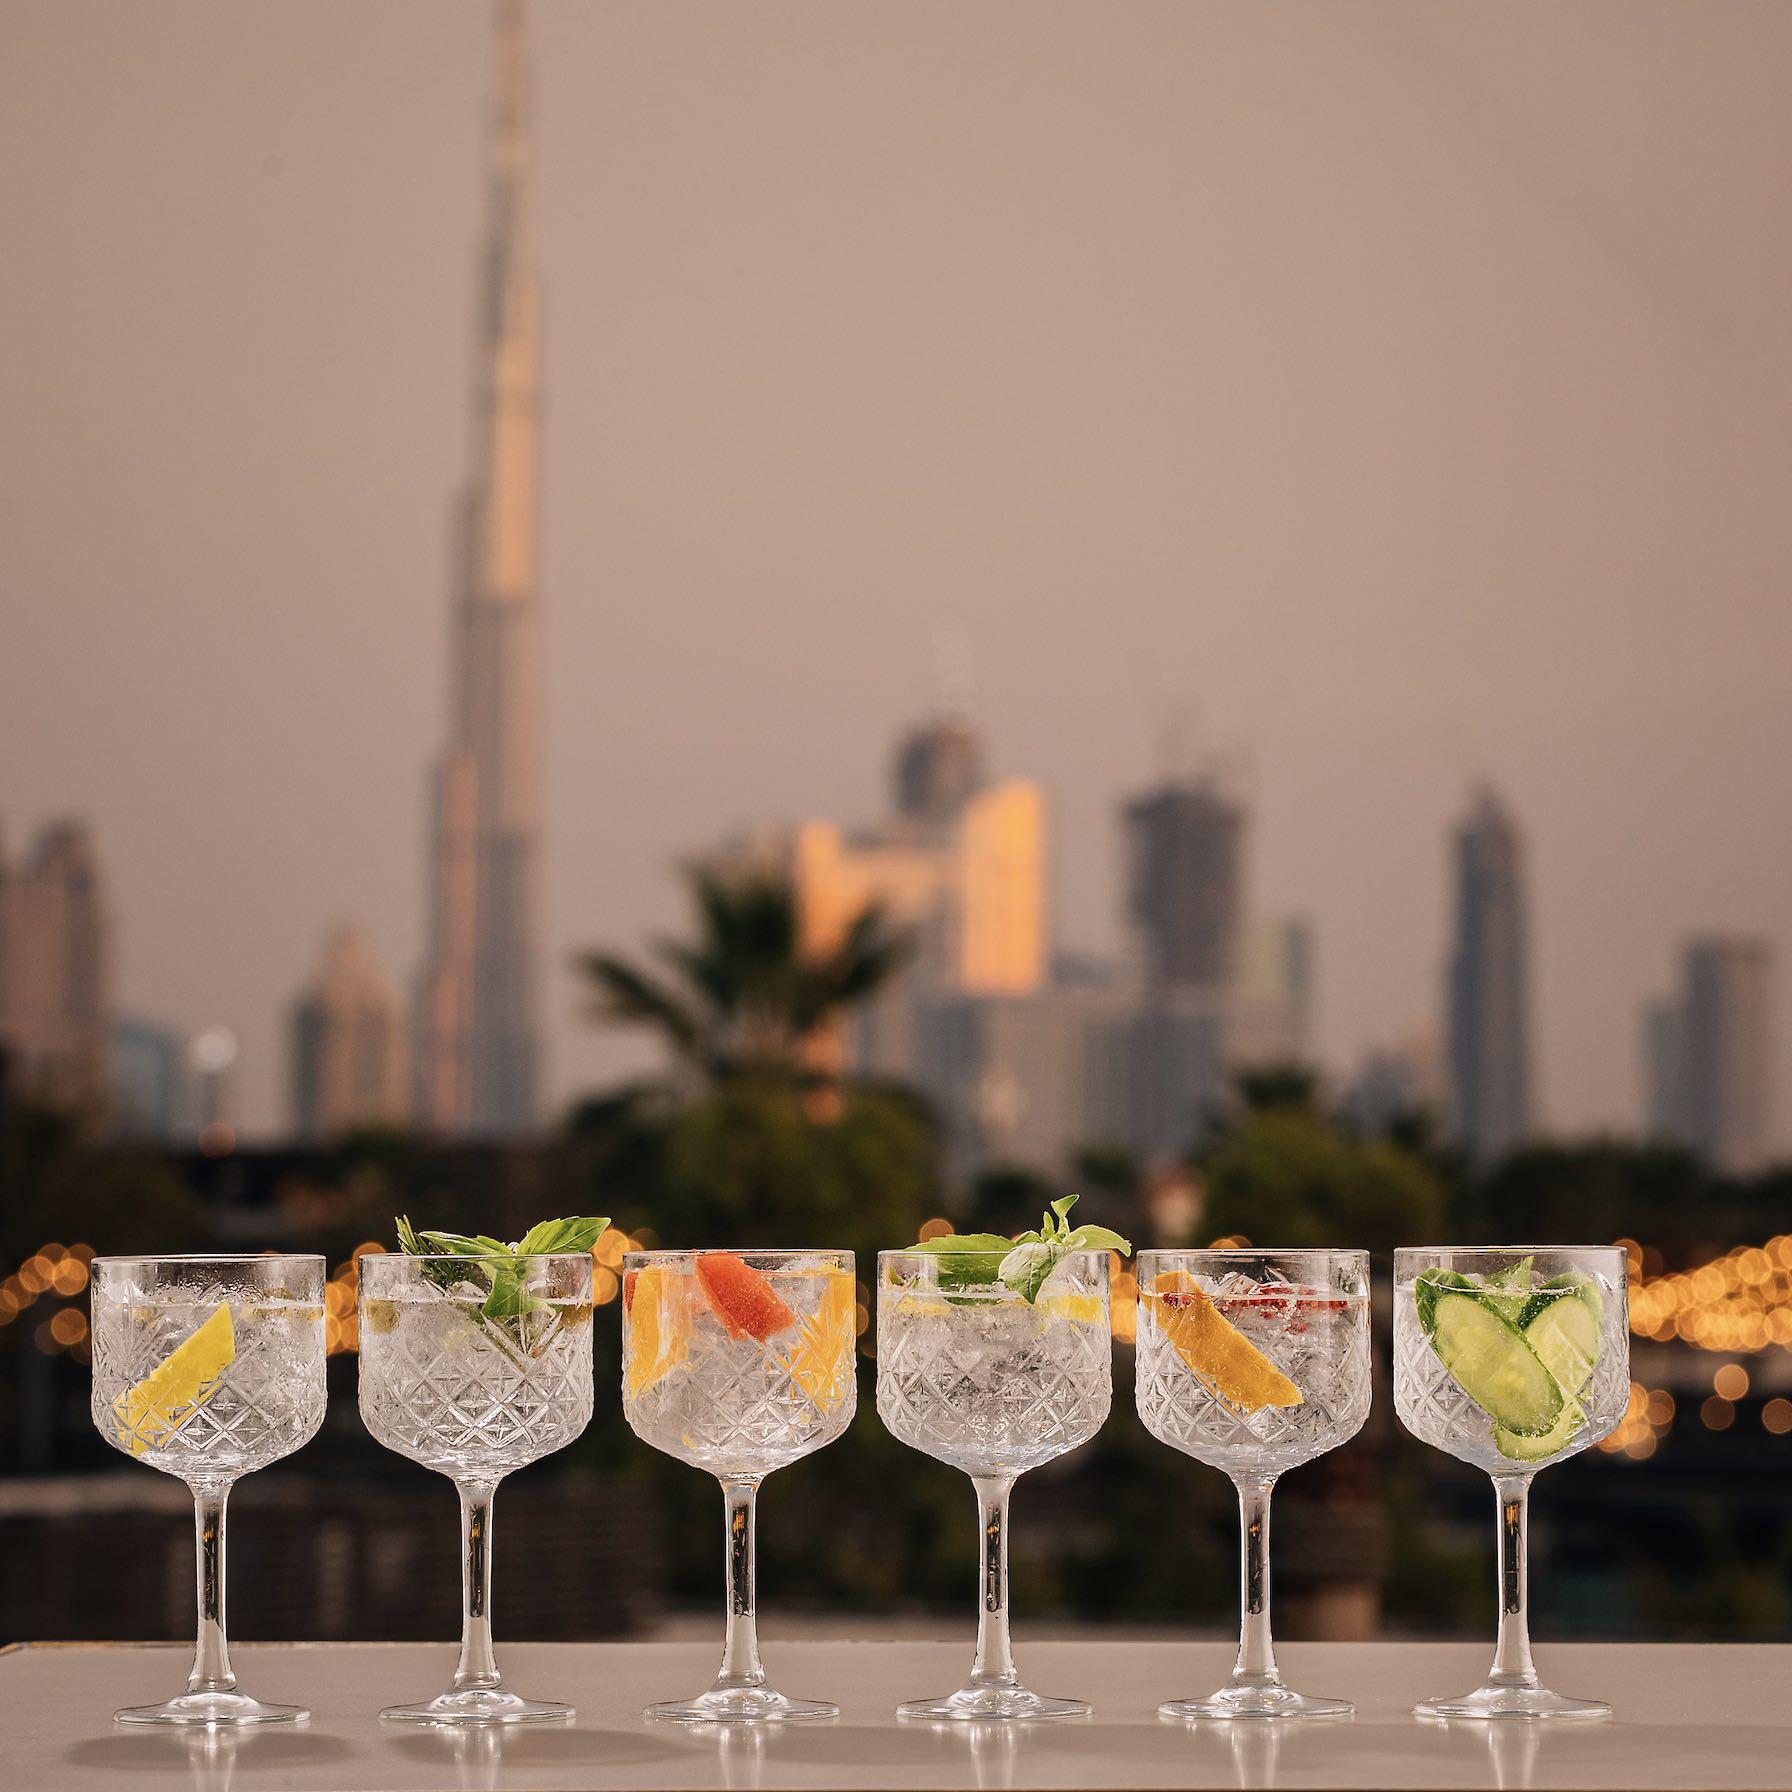 dine in Dubai